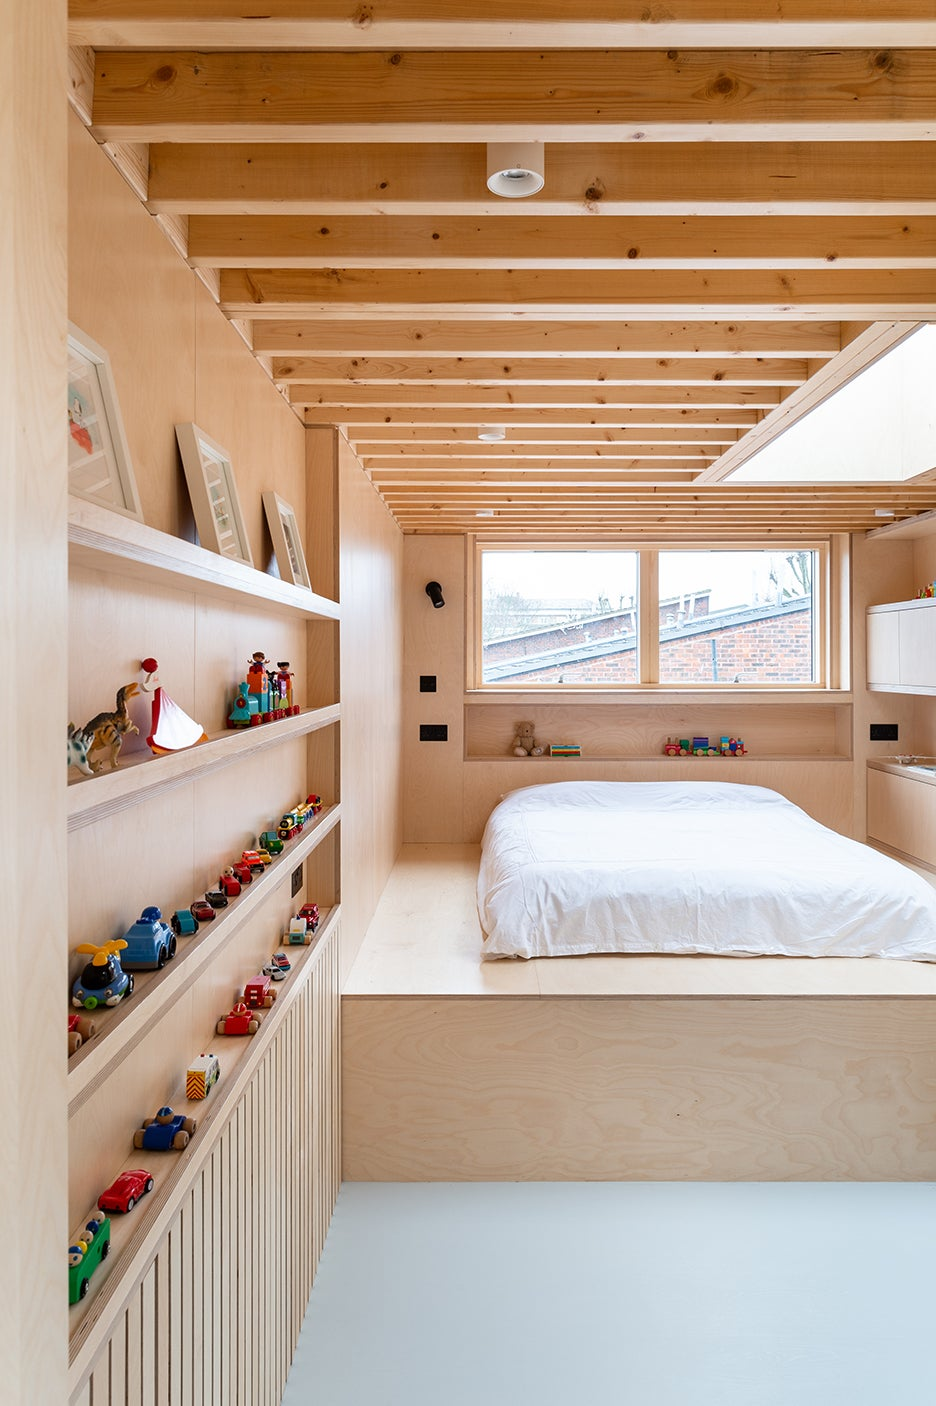 mattress on plywood platoform